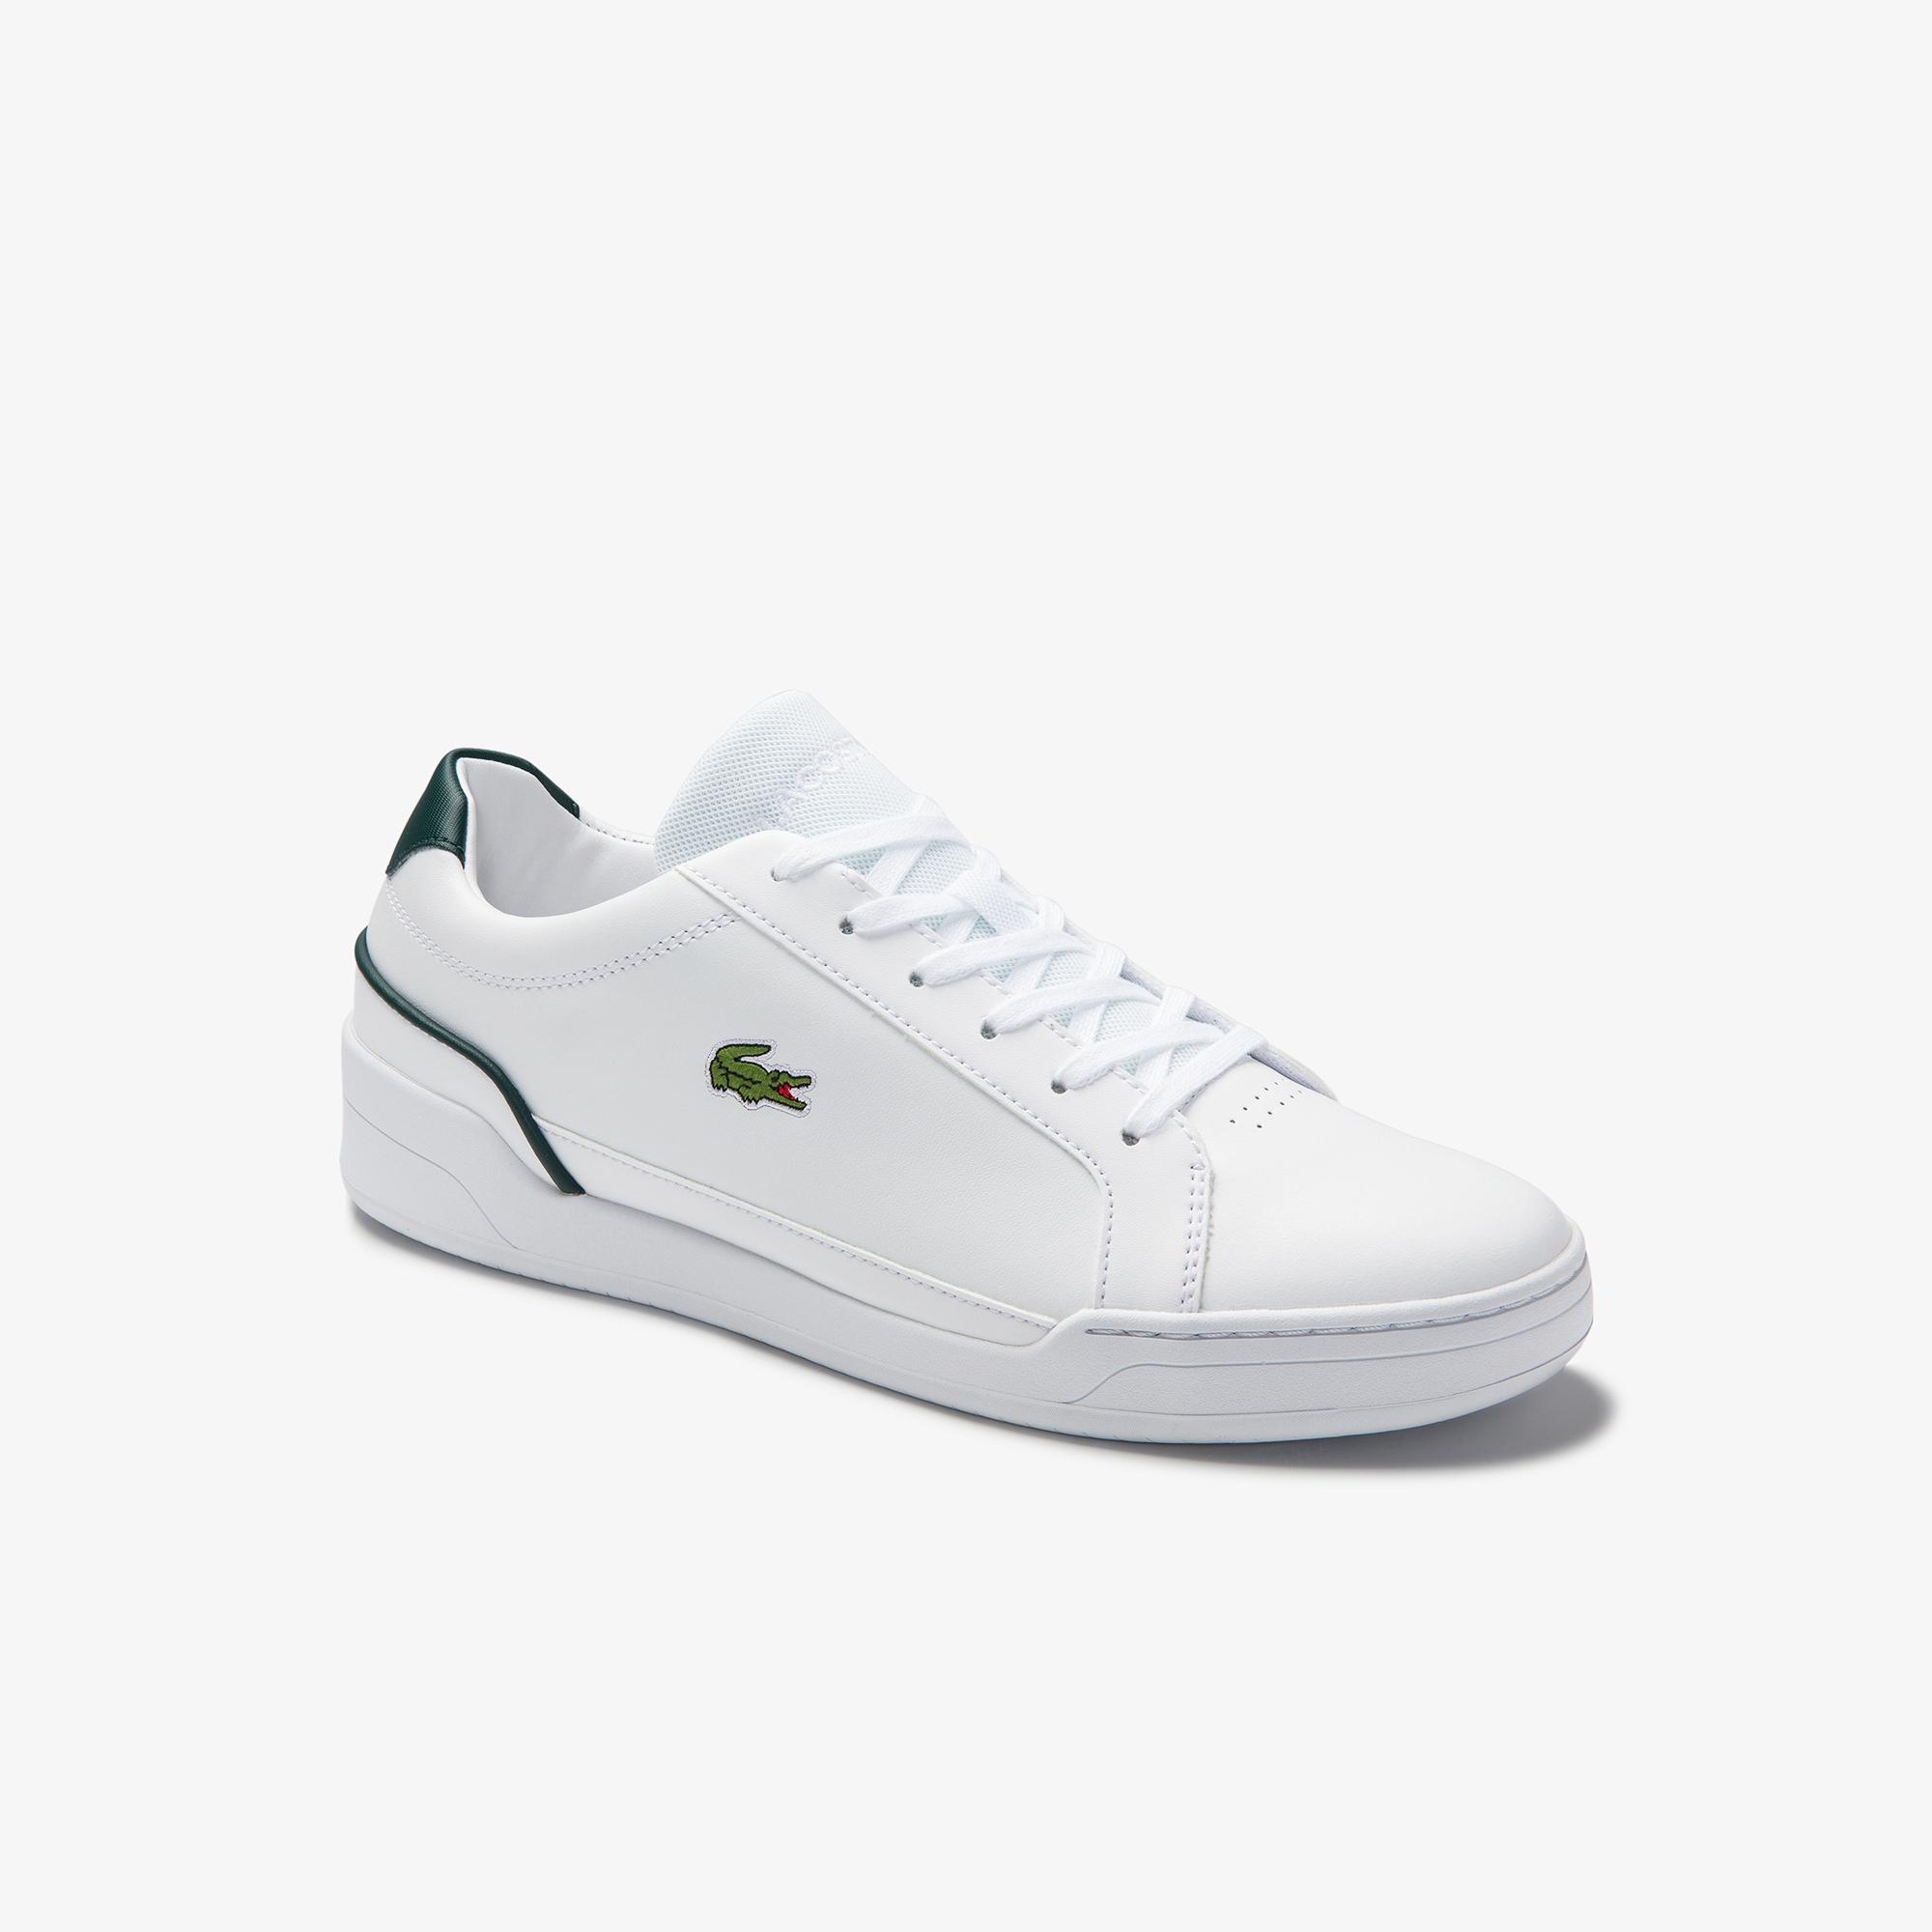 Lacoste Men's Challenge Textured Leather Sneakers